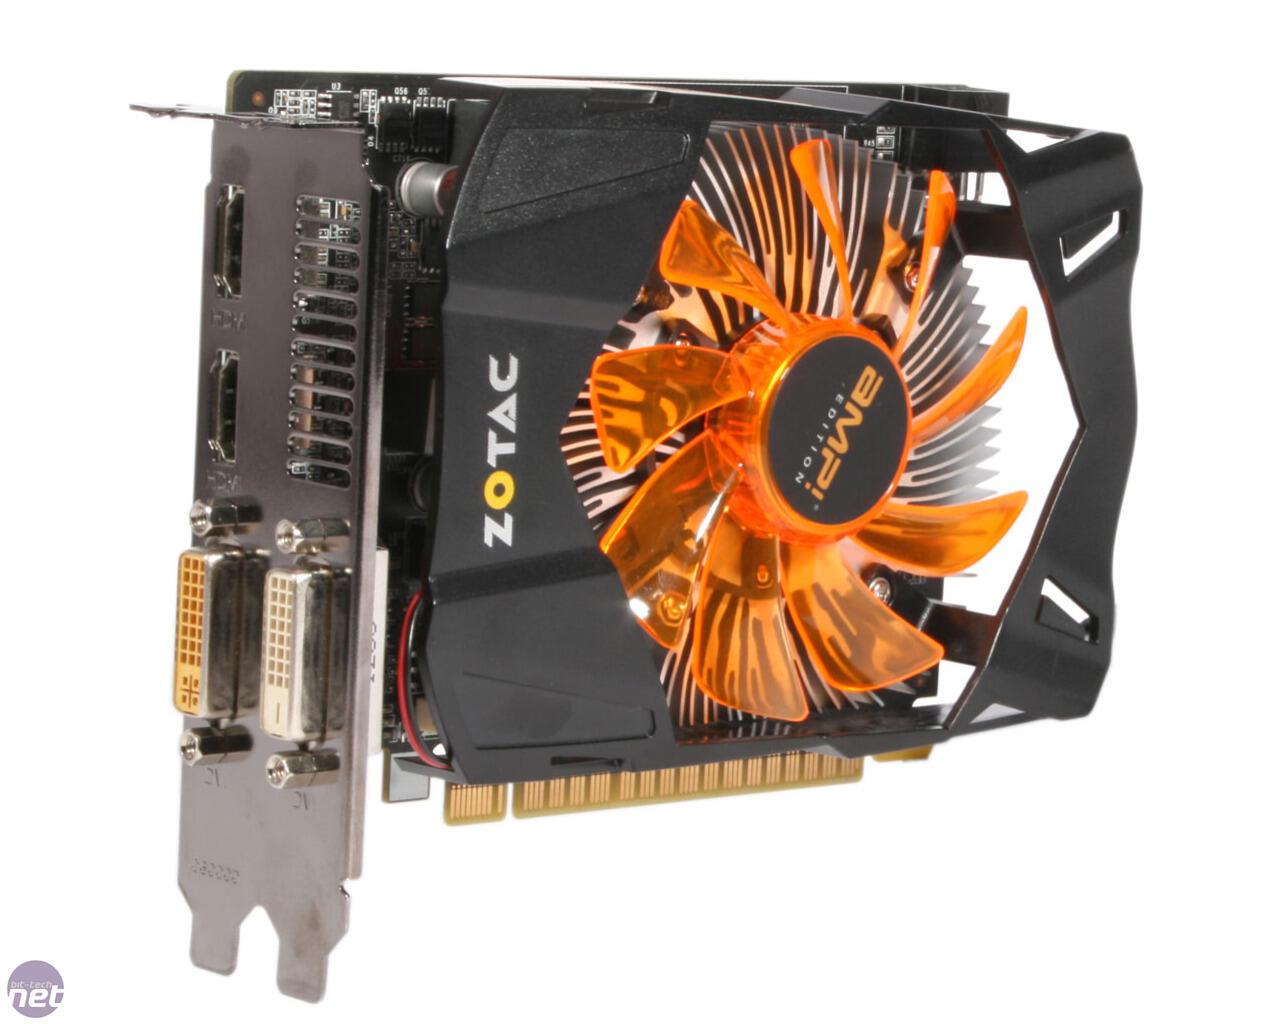 ZOTAC GTX 650 Ti AMP 2GB DDR5 (Bandung)